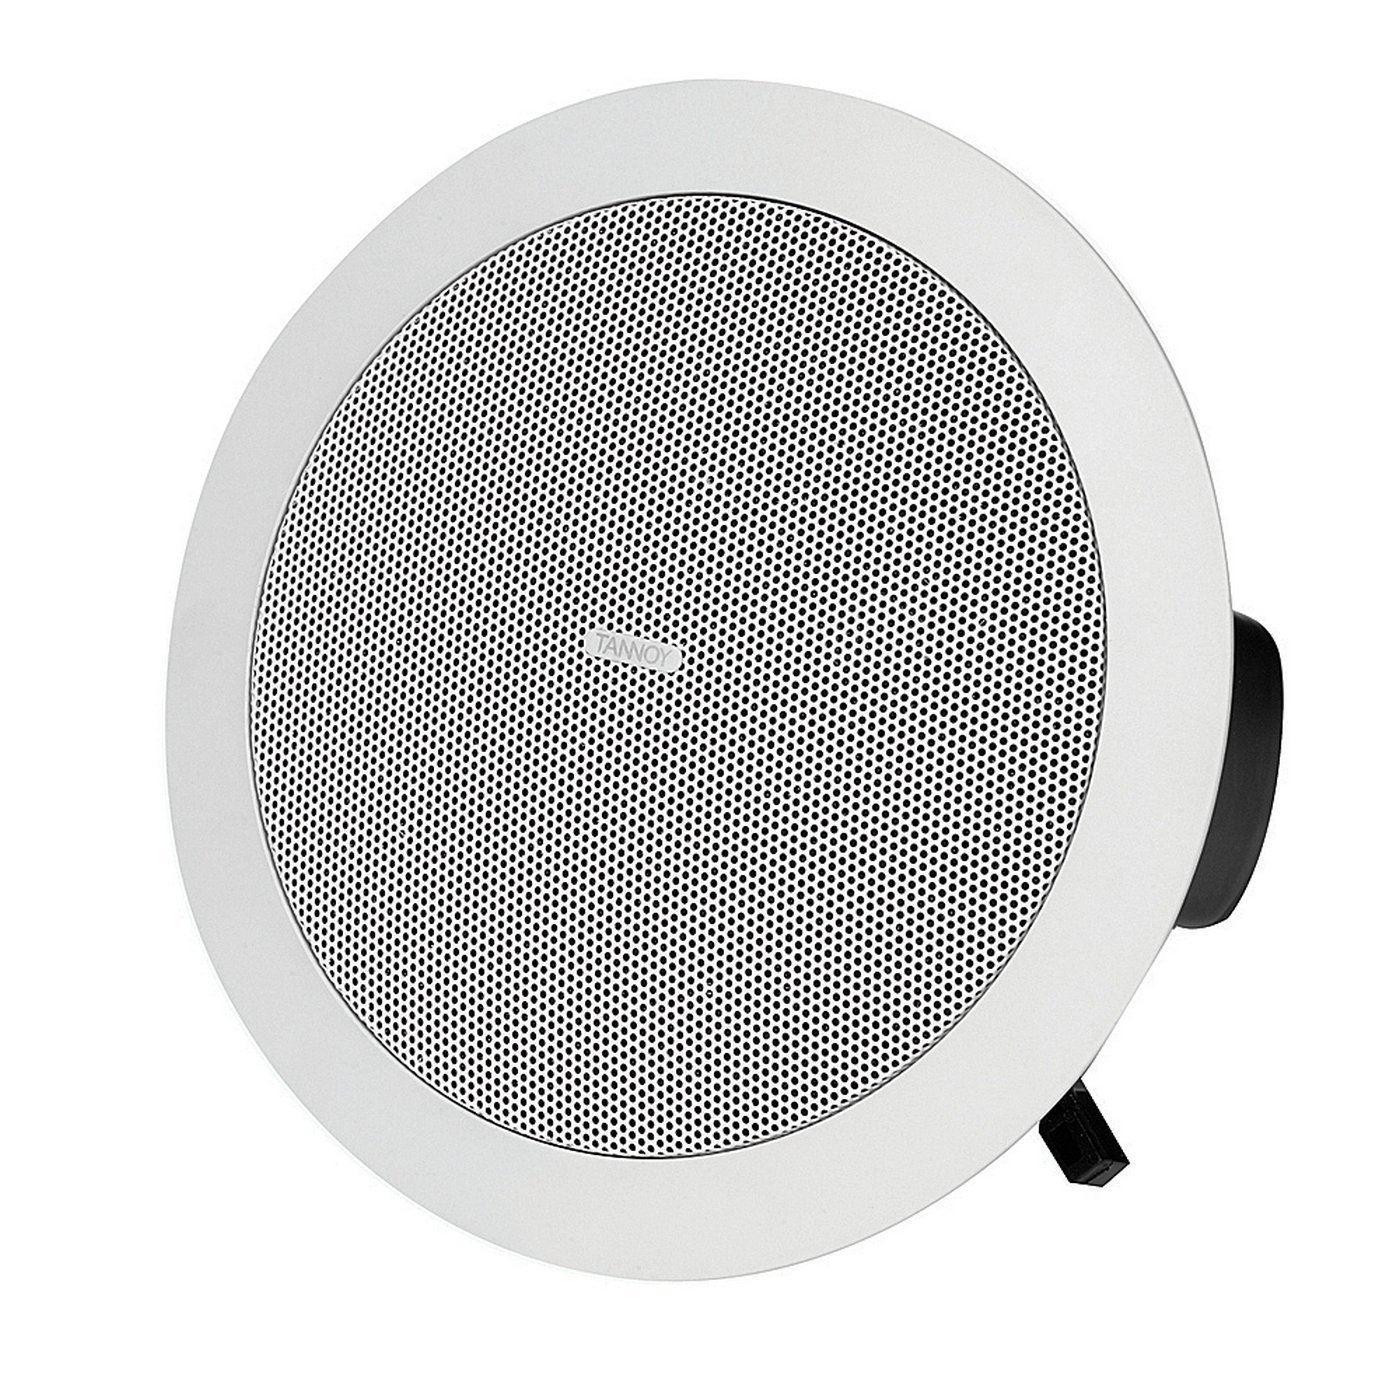 Tannoy Cvs4 ลำโพงติดเพดาน 2 Way Ceiling Monitor Speaker